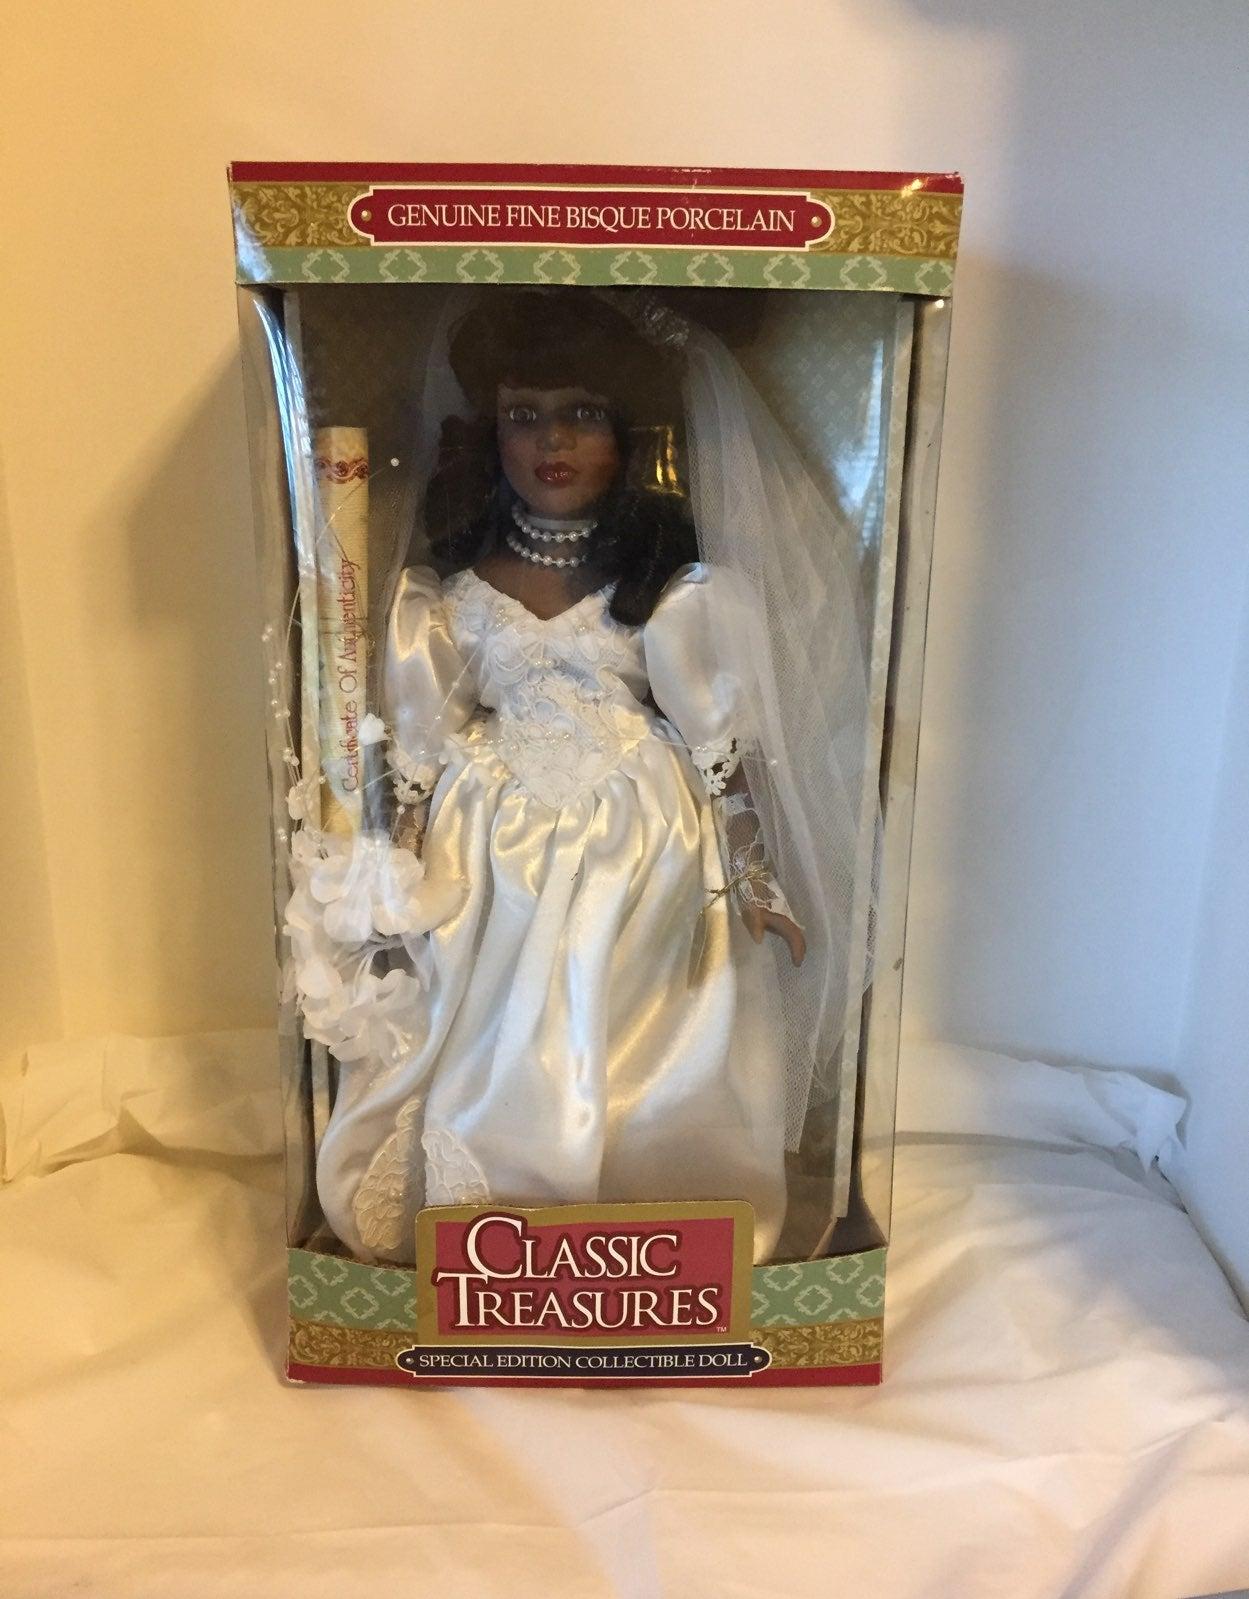 Classic Treasures Doll